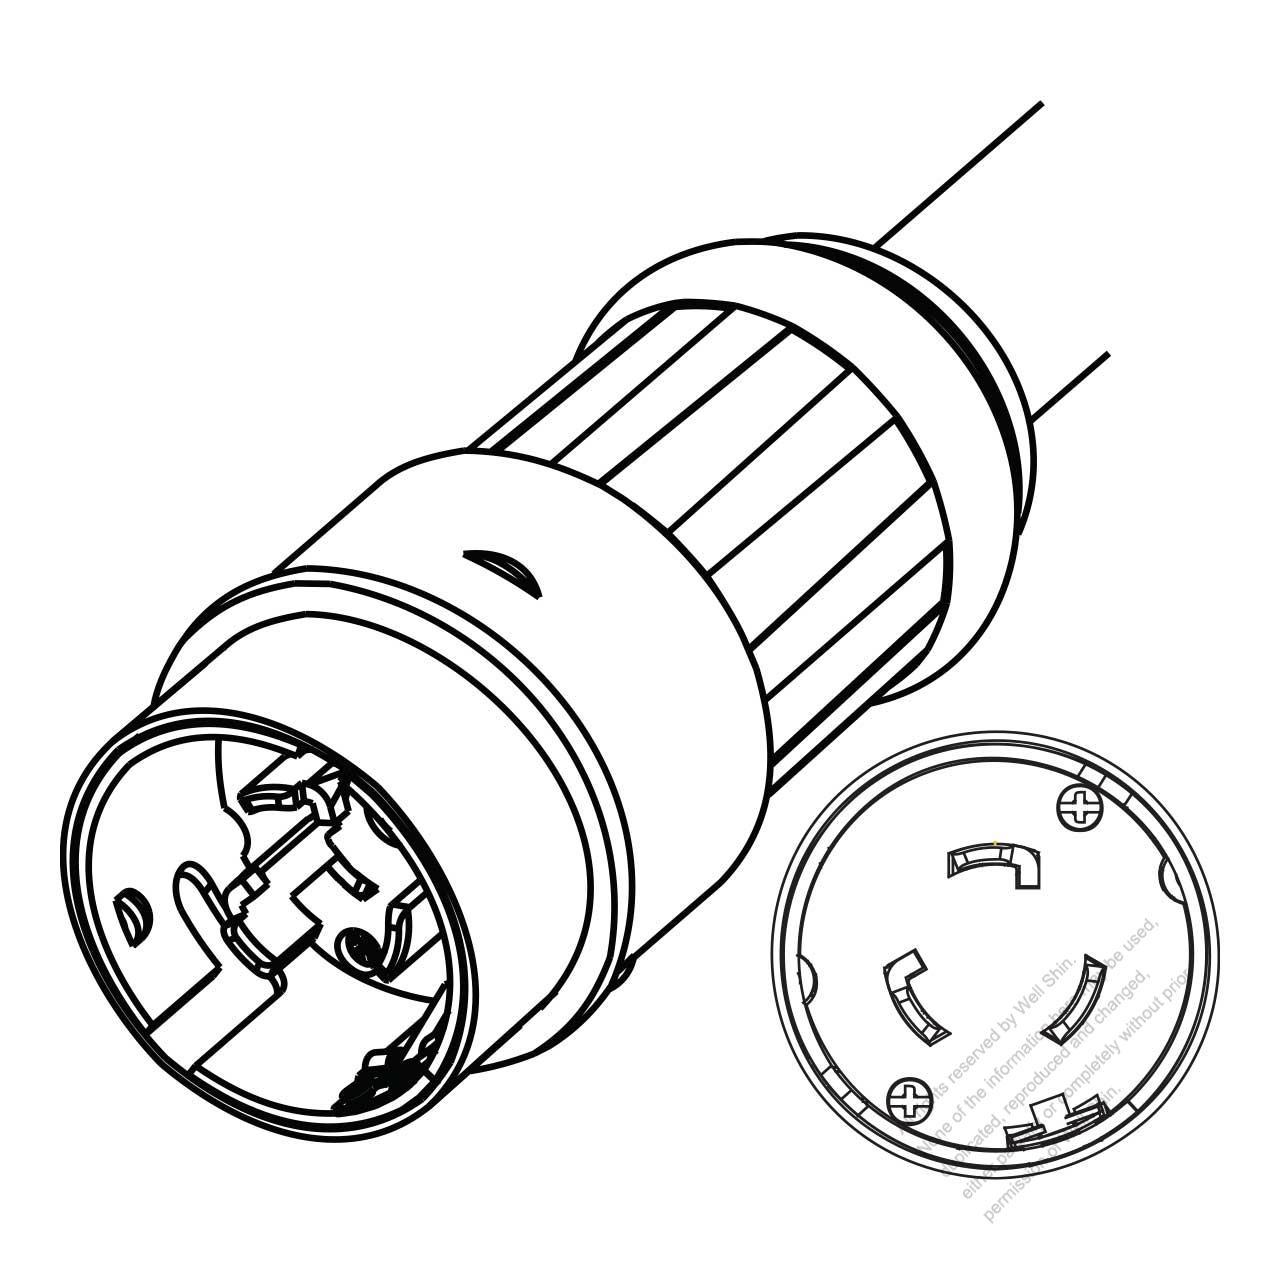 L15 20p Plug Wiring Diagram